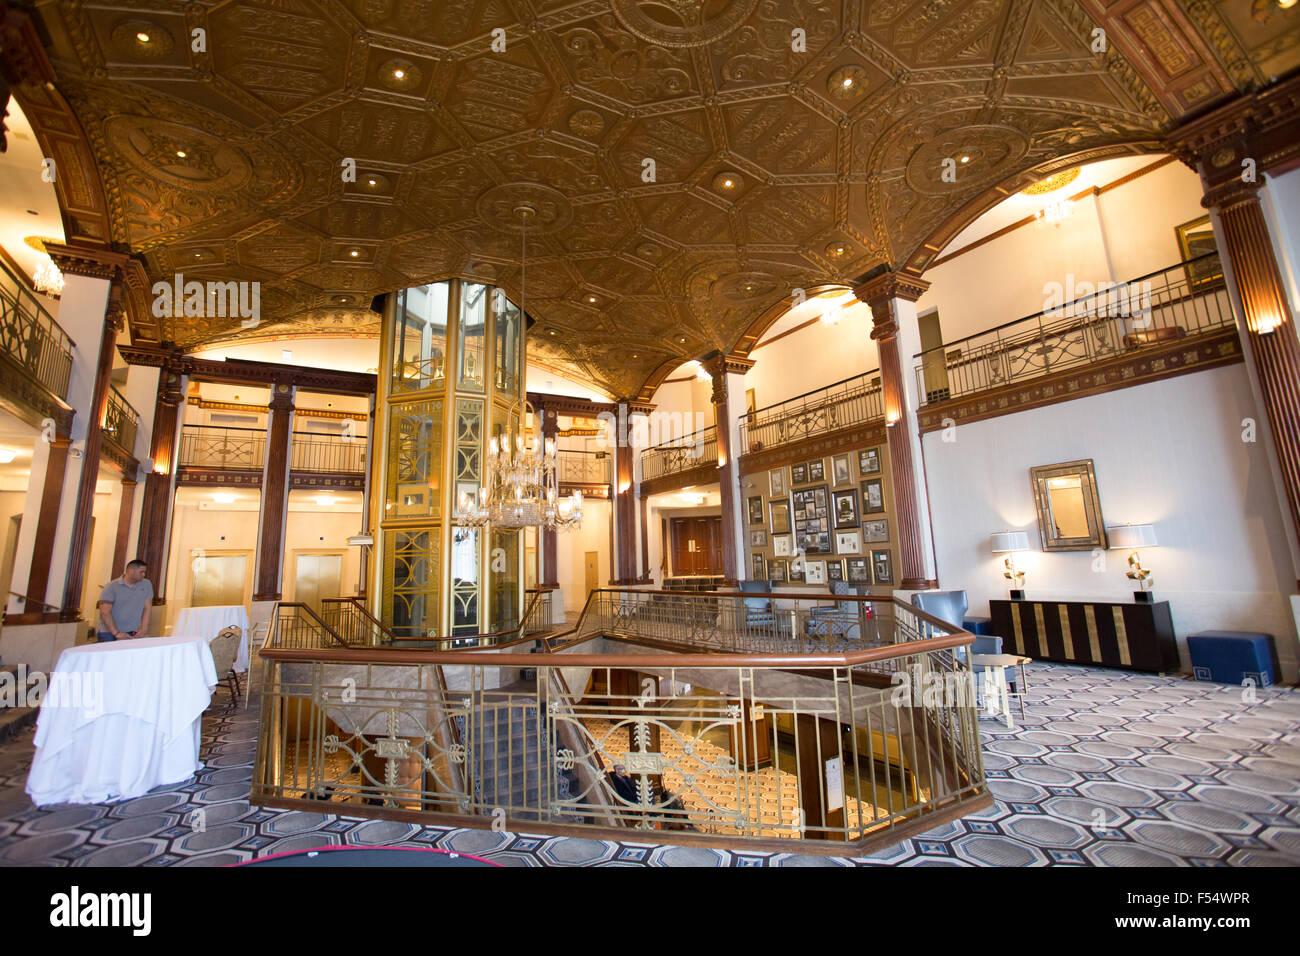 providence biltmore hilton hotel - Stock Image